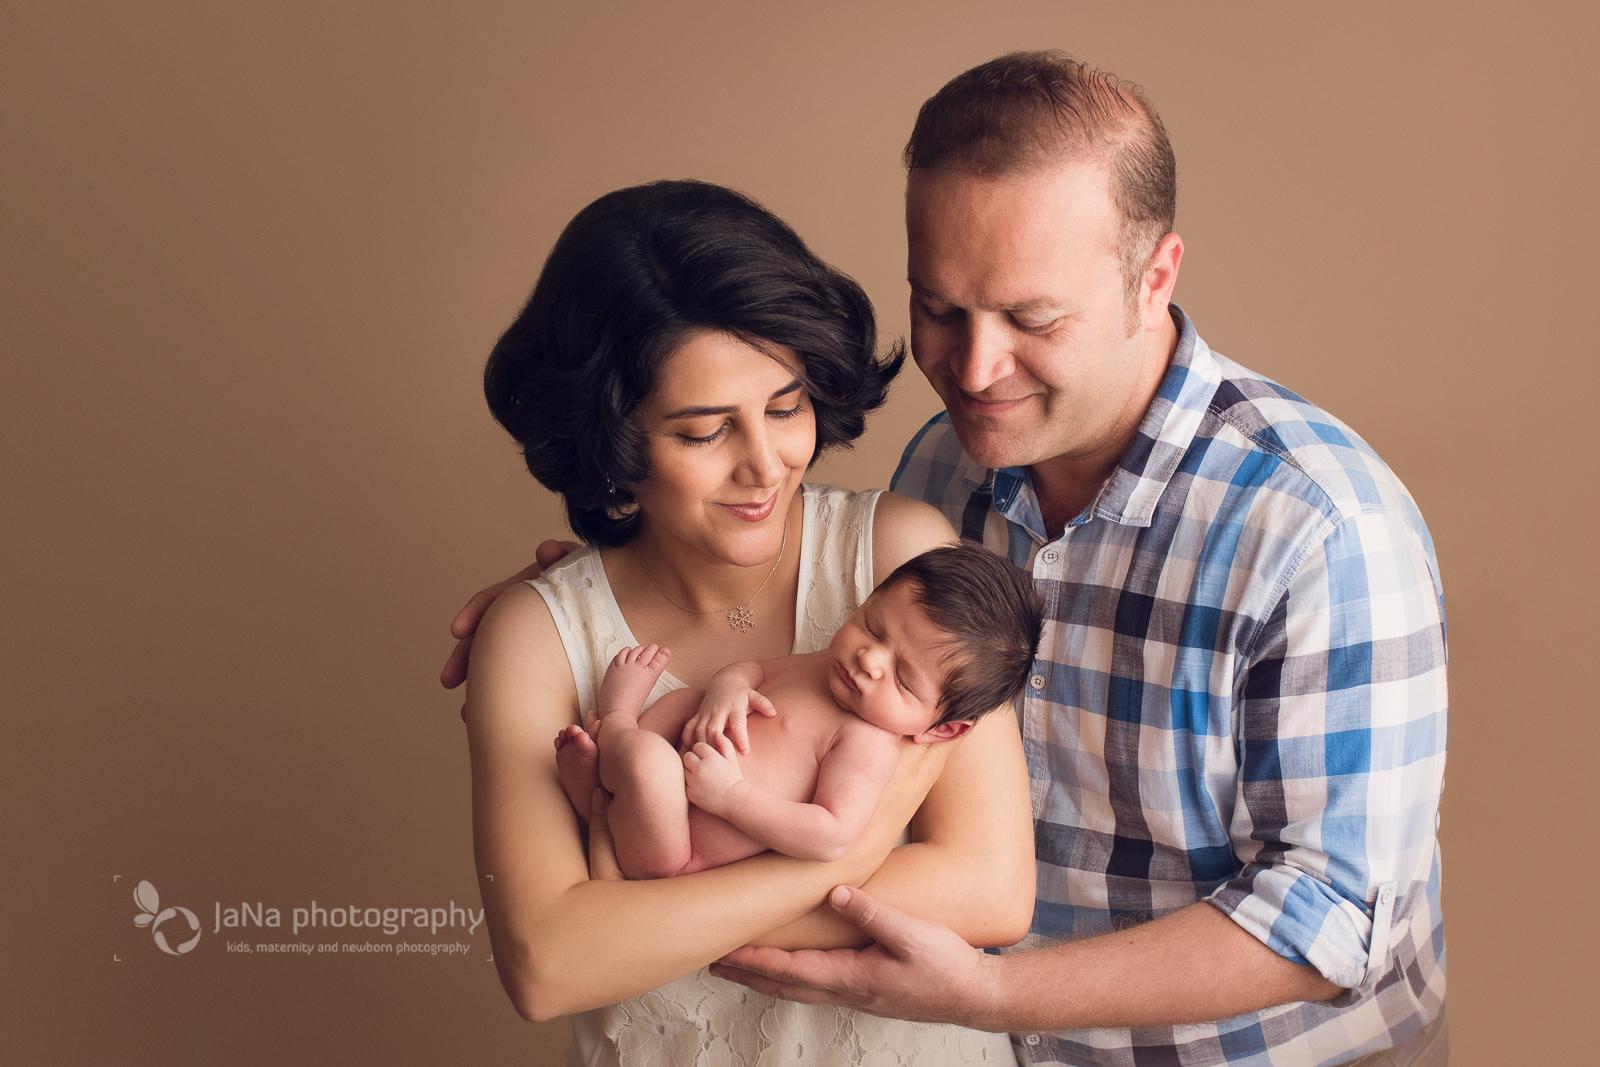 Vancouver newborn photography | Rayn